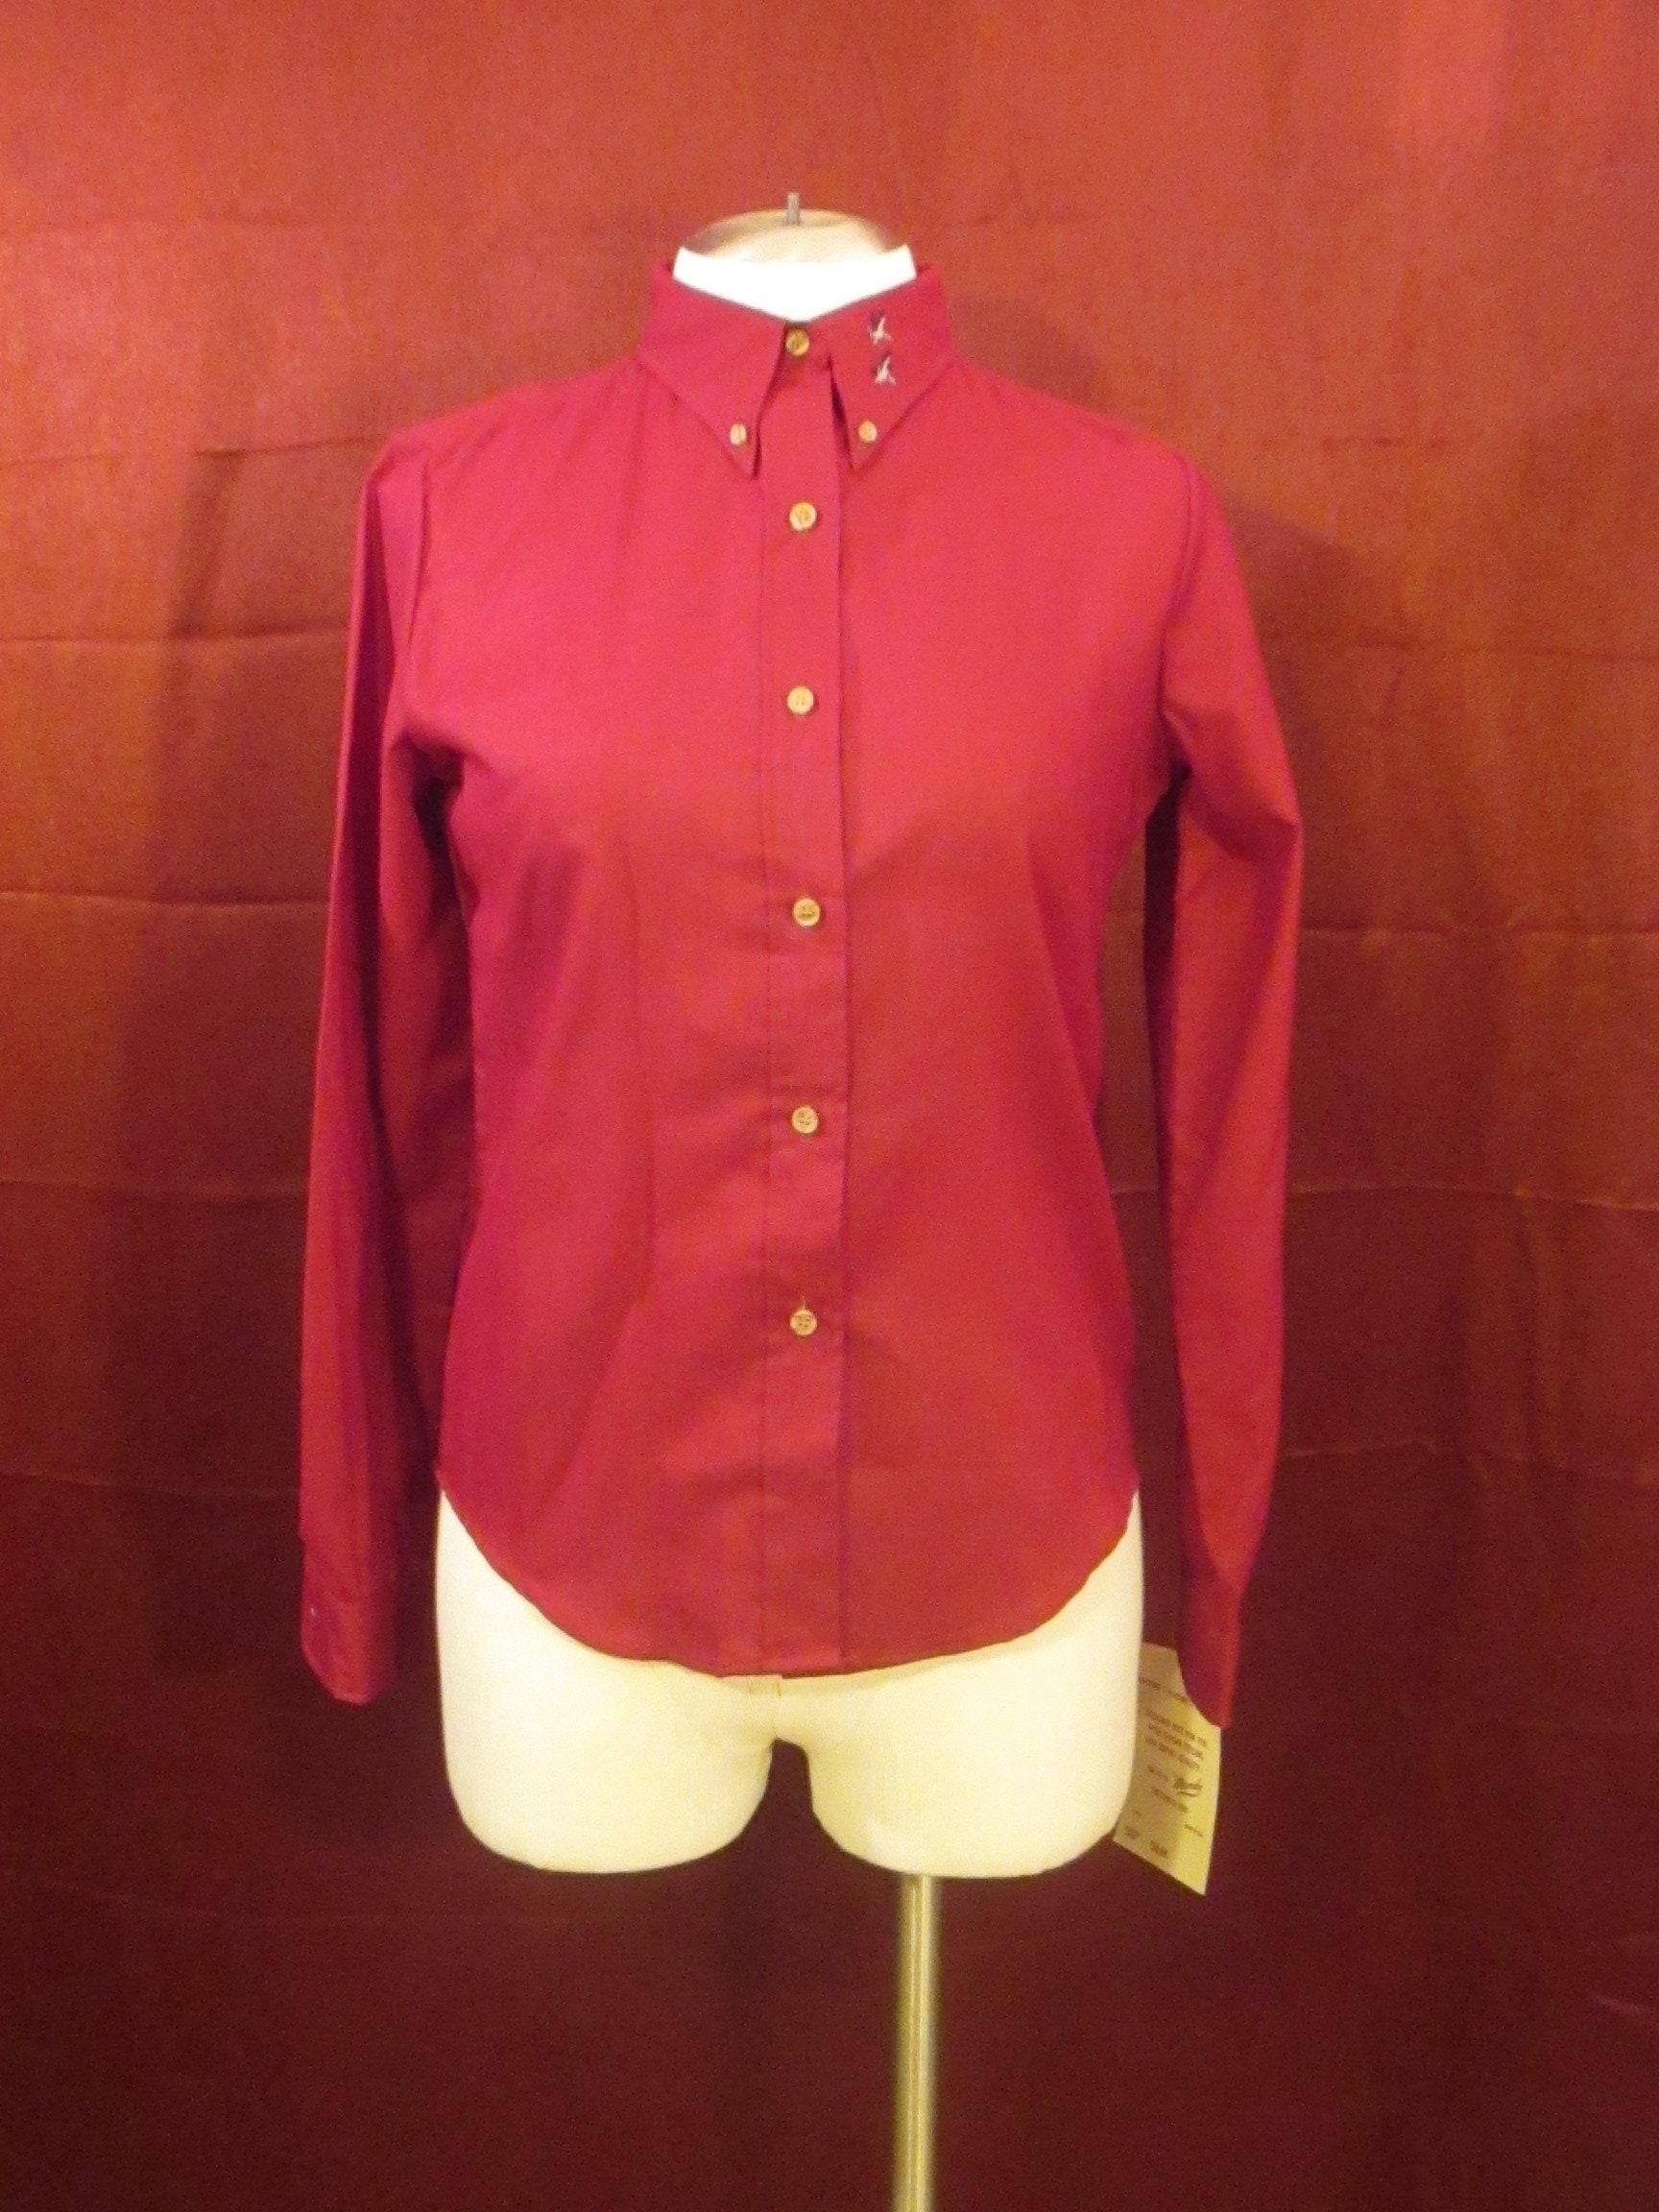 6560f0723b1 Vintage Vtg Mandy womens shirt M 9 10 embroidered ducks button